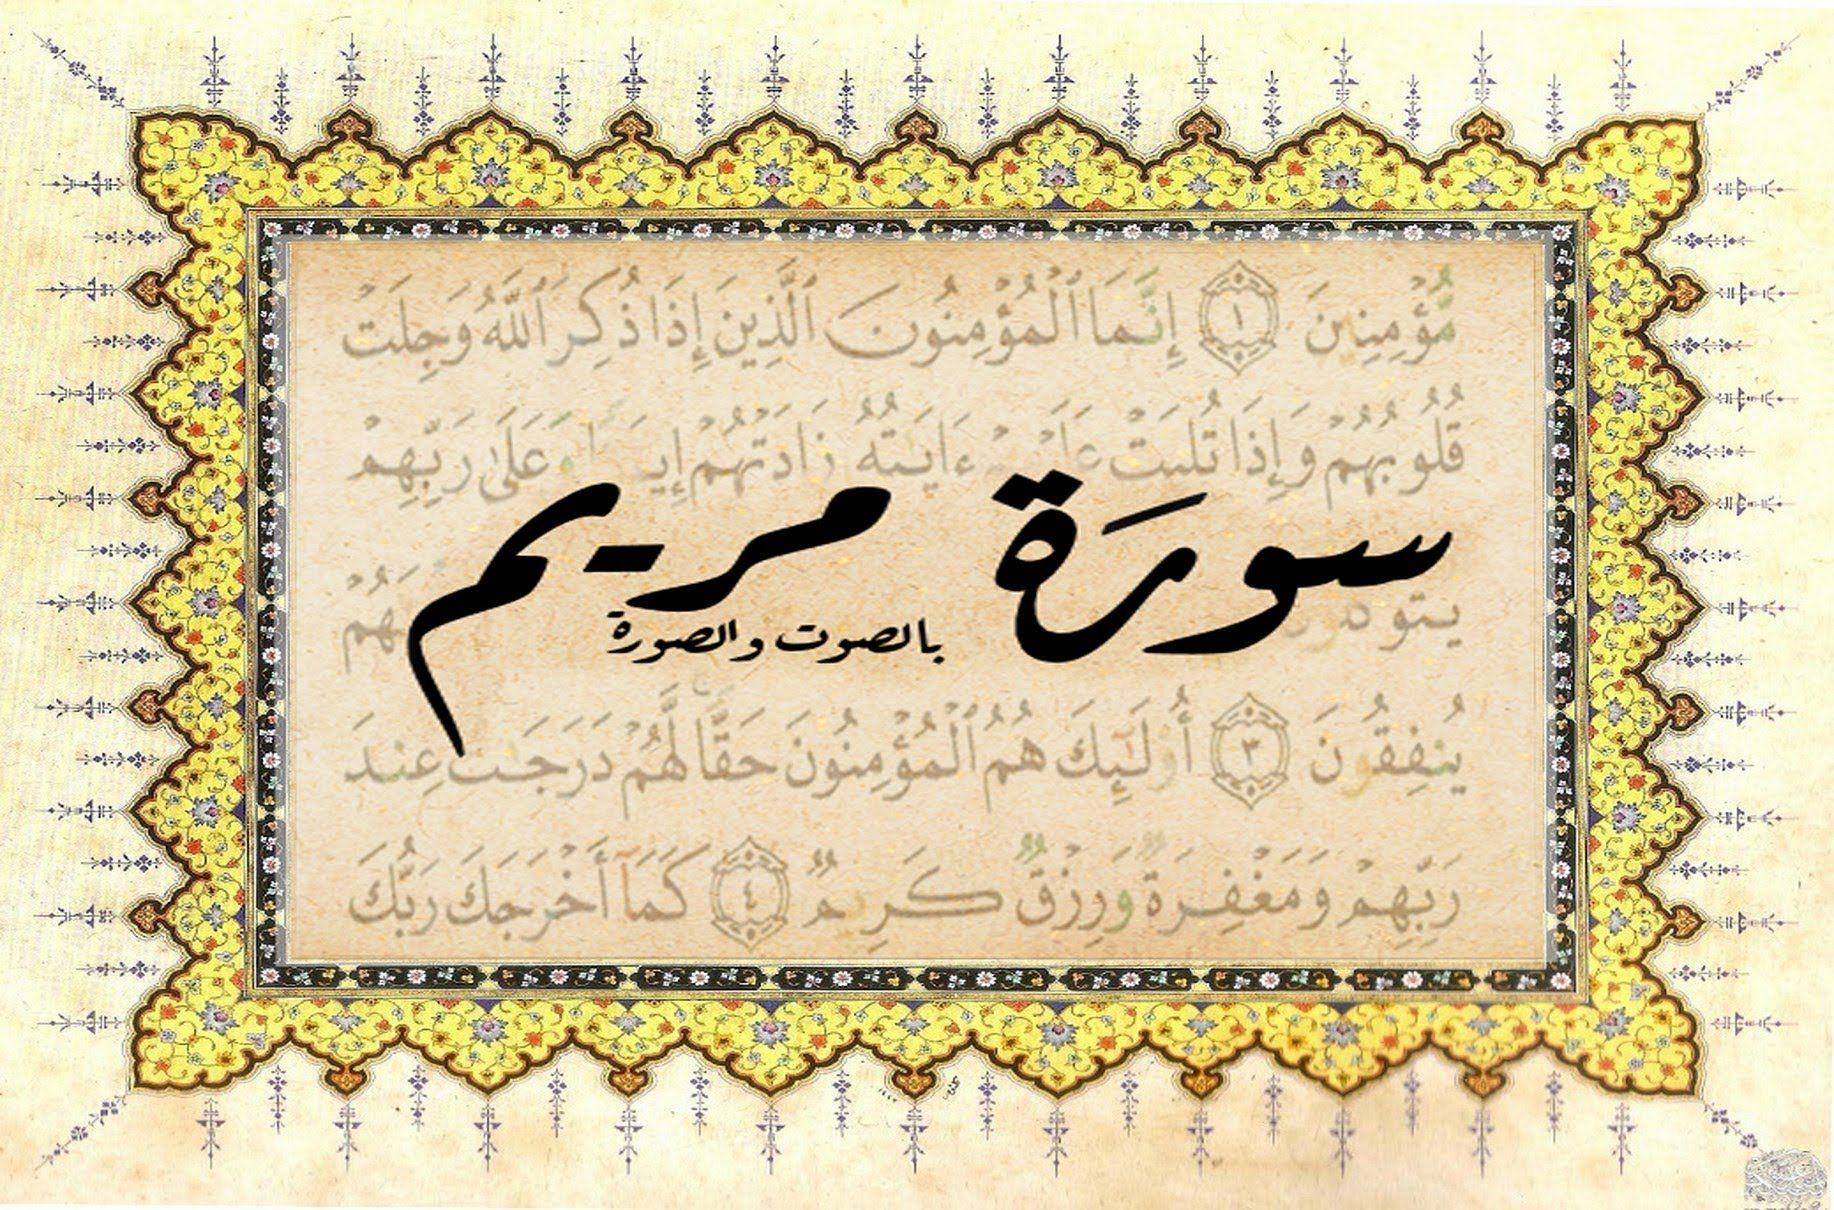 سورة مريم مكتوبة بصوت ماهر المعيقلي Holy Quran Art Arabic Calligraphy